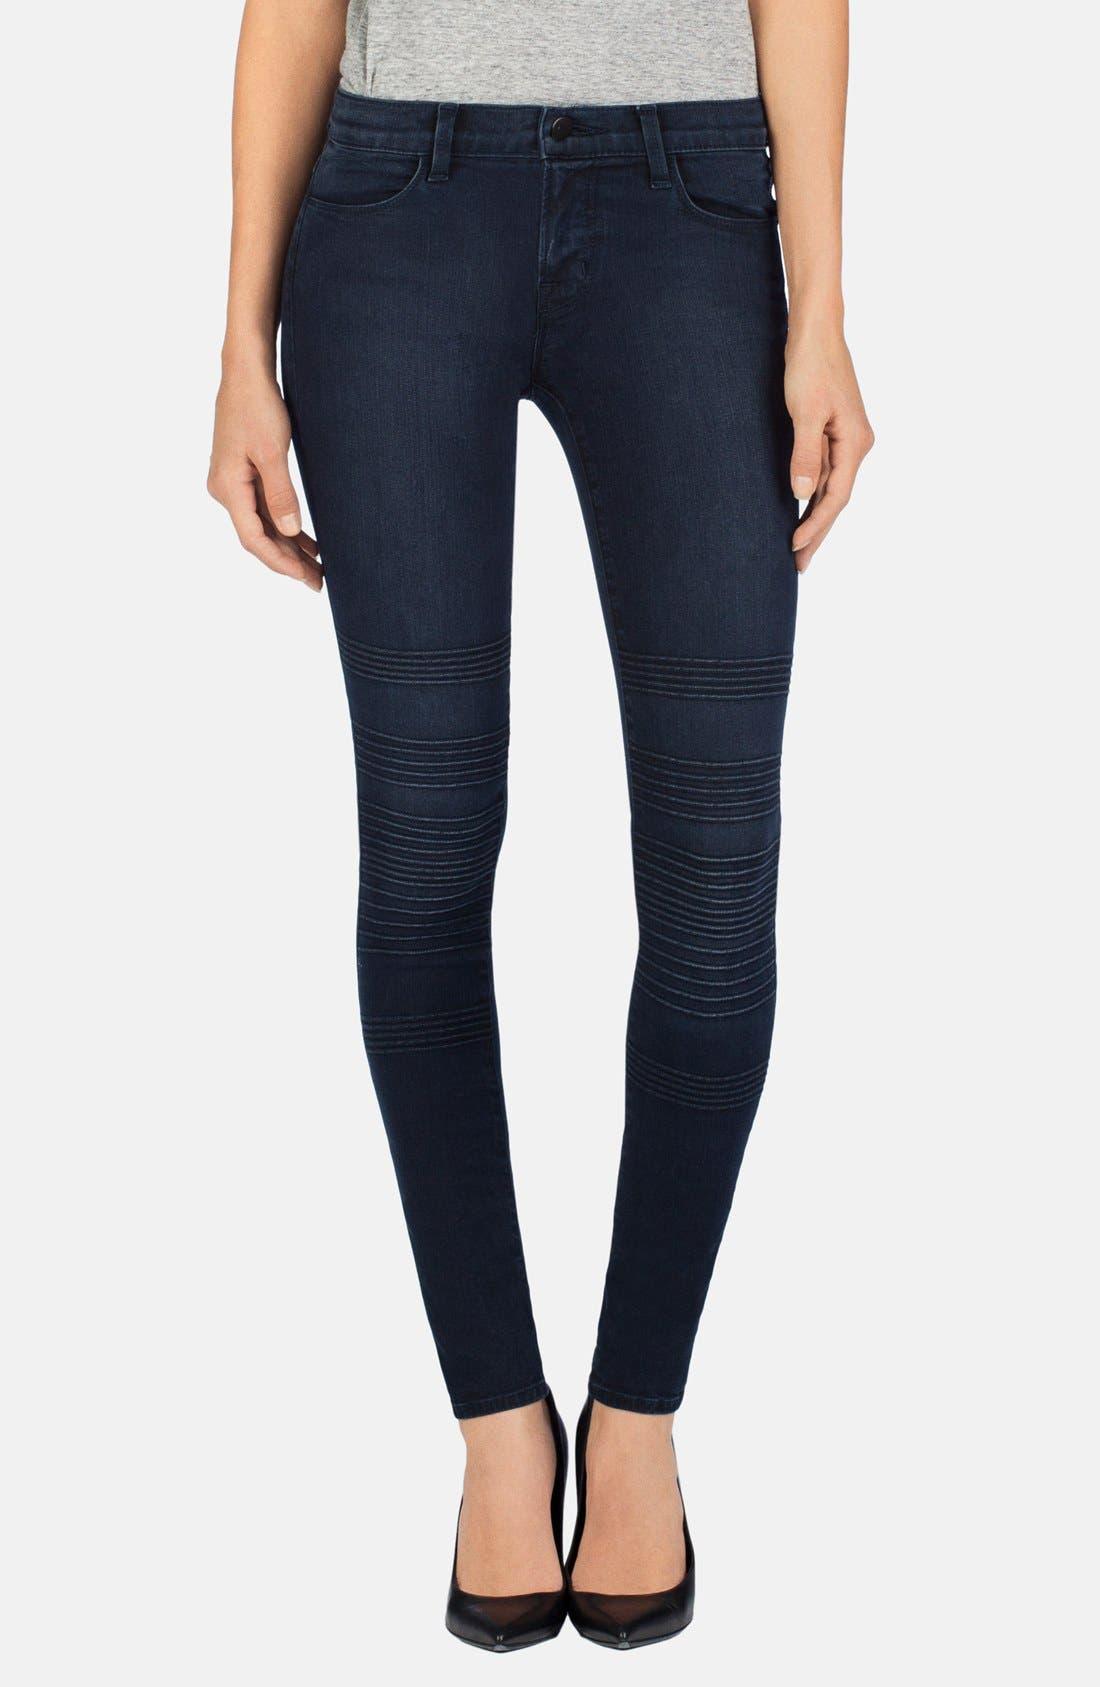 Main Image - J Brand 'Willow' Moto Skinny Jeans (Verve)